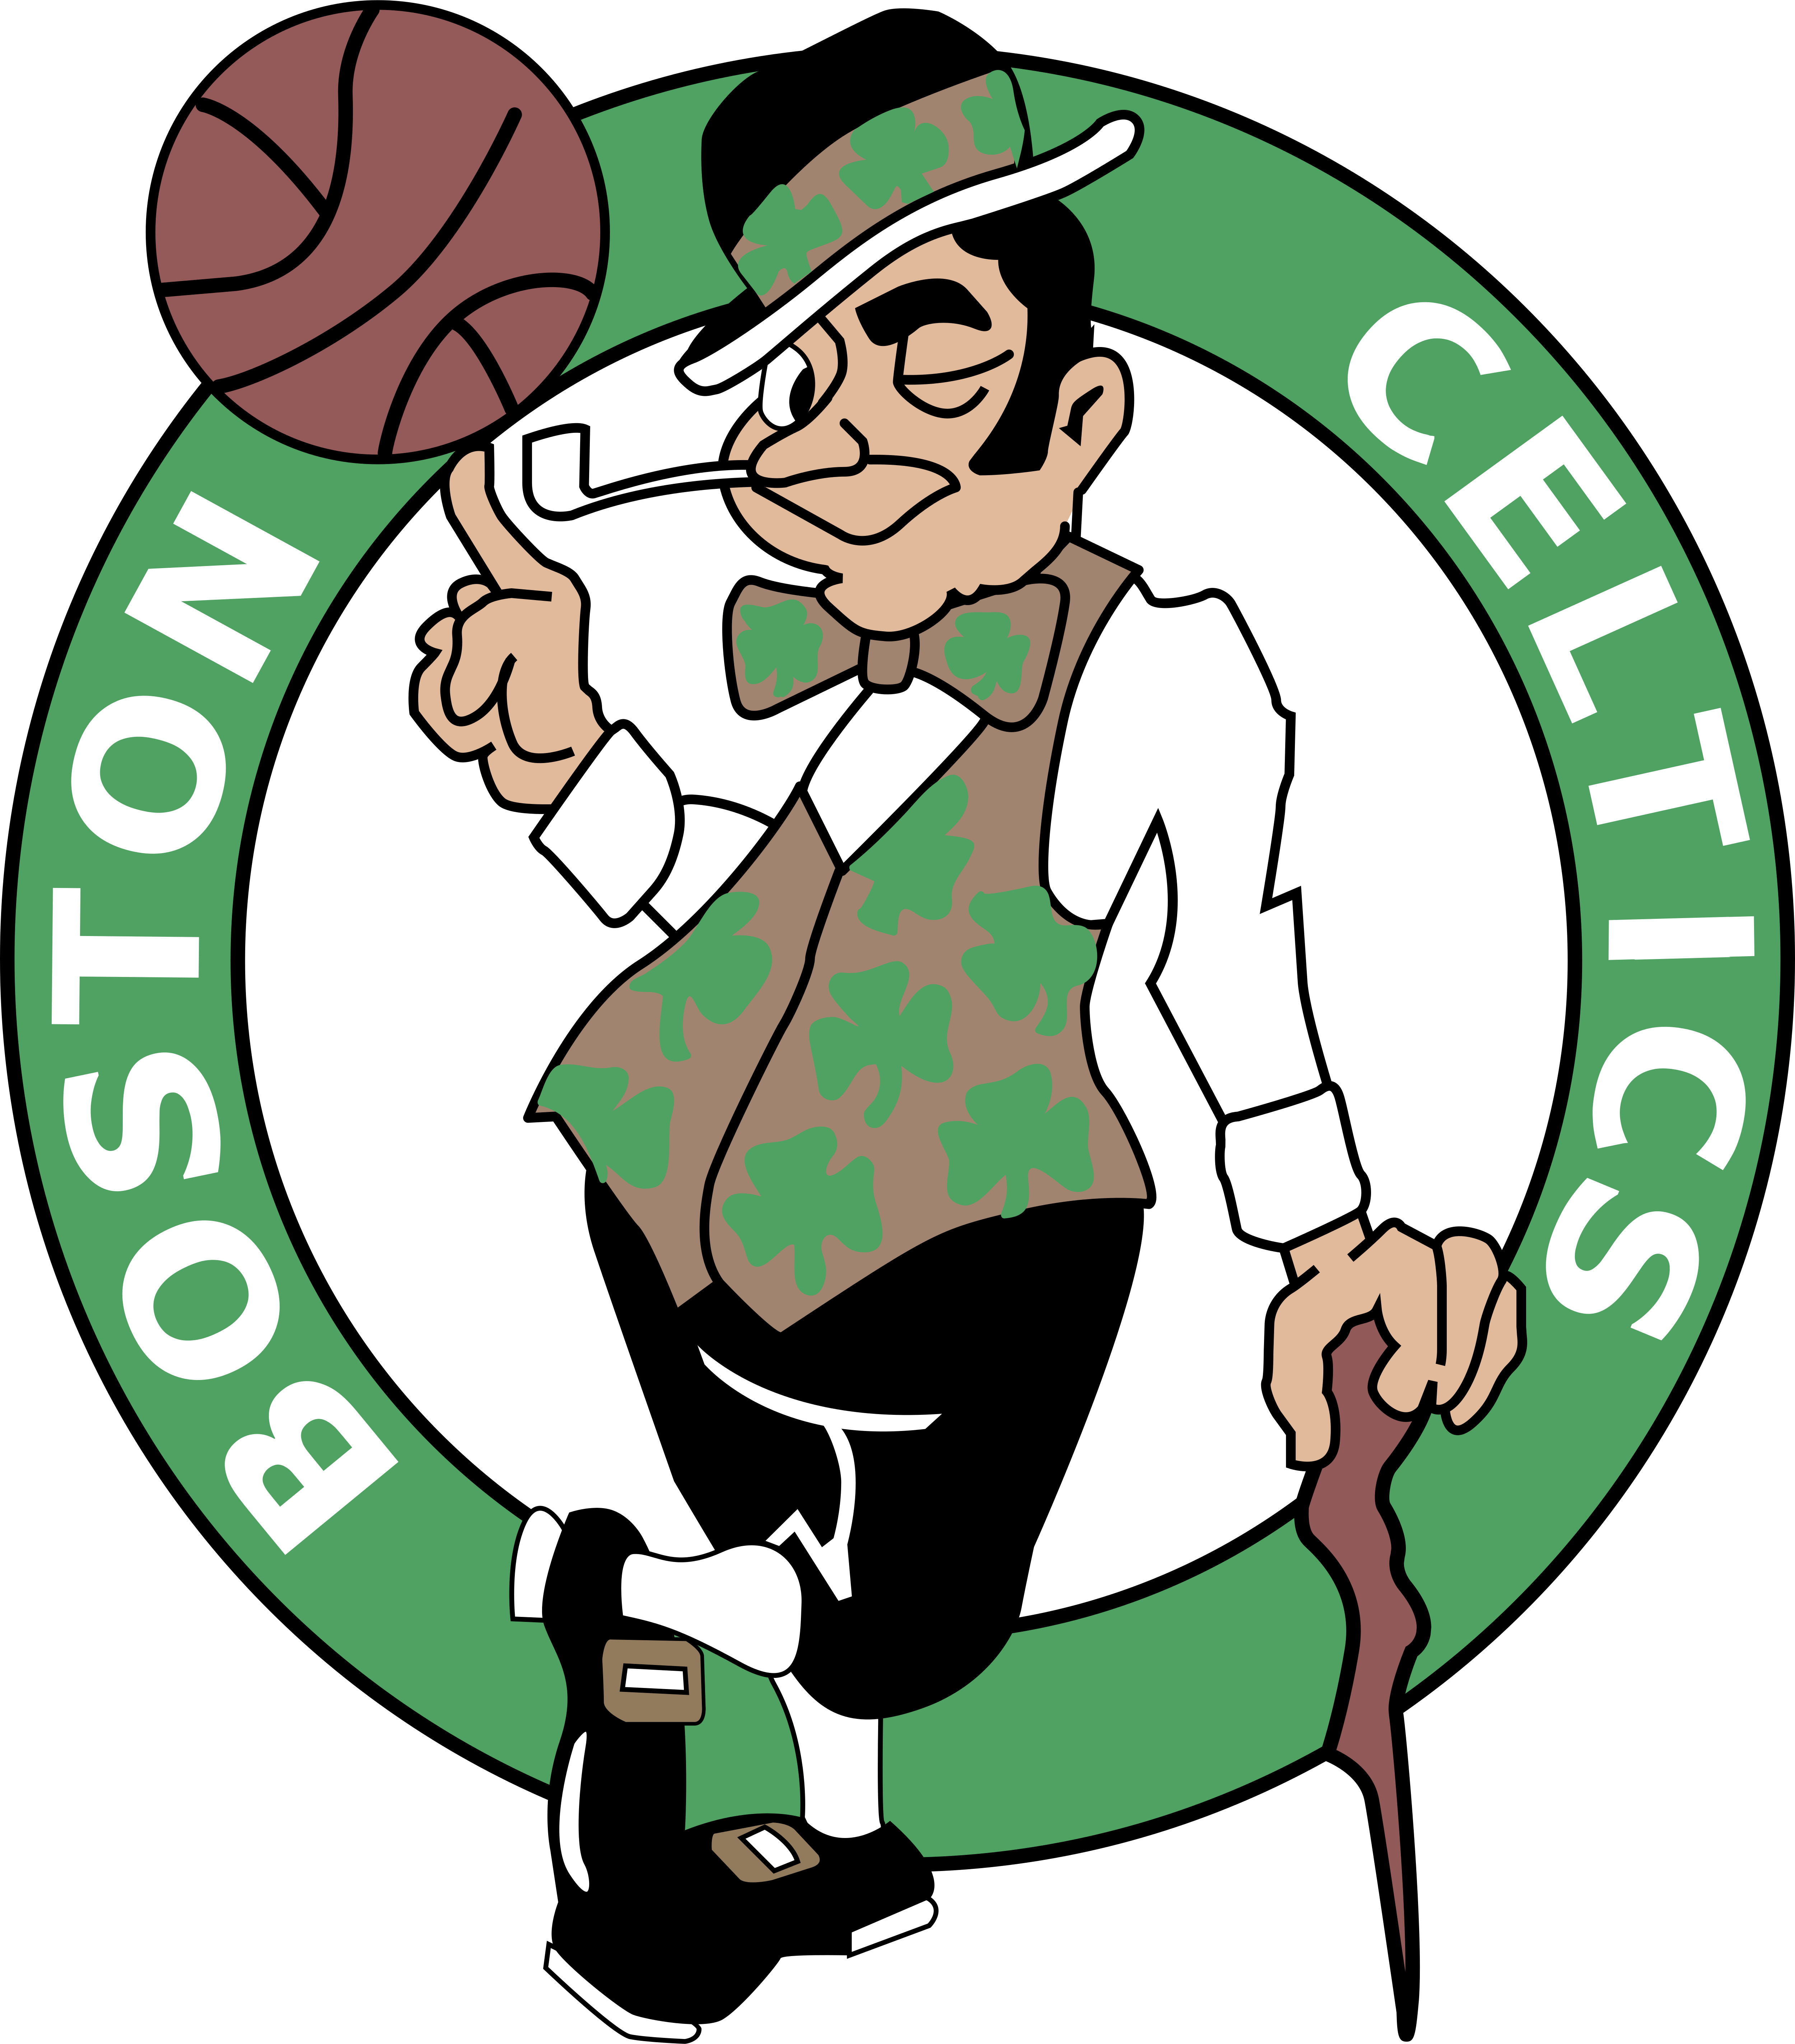 Boston Celtics Logos Download